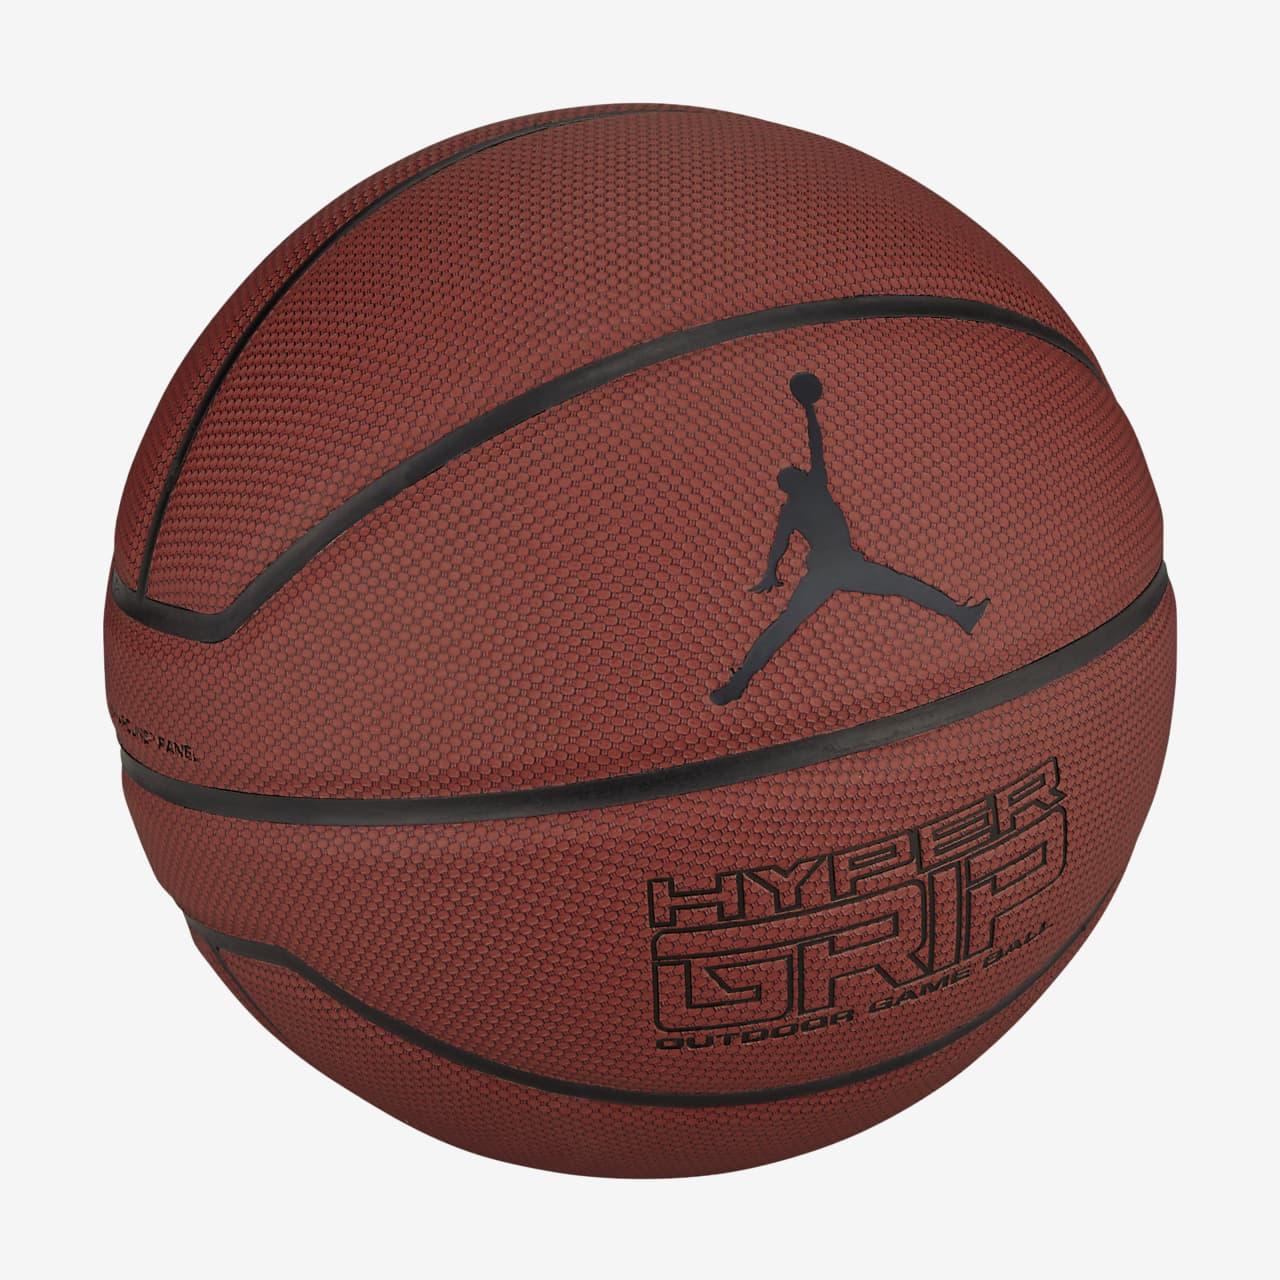 Pallone da basket Jordan HyperGrip 4P